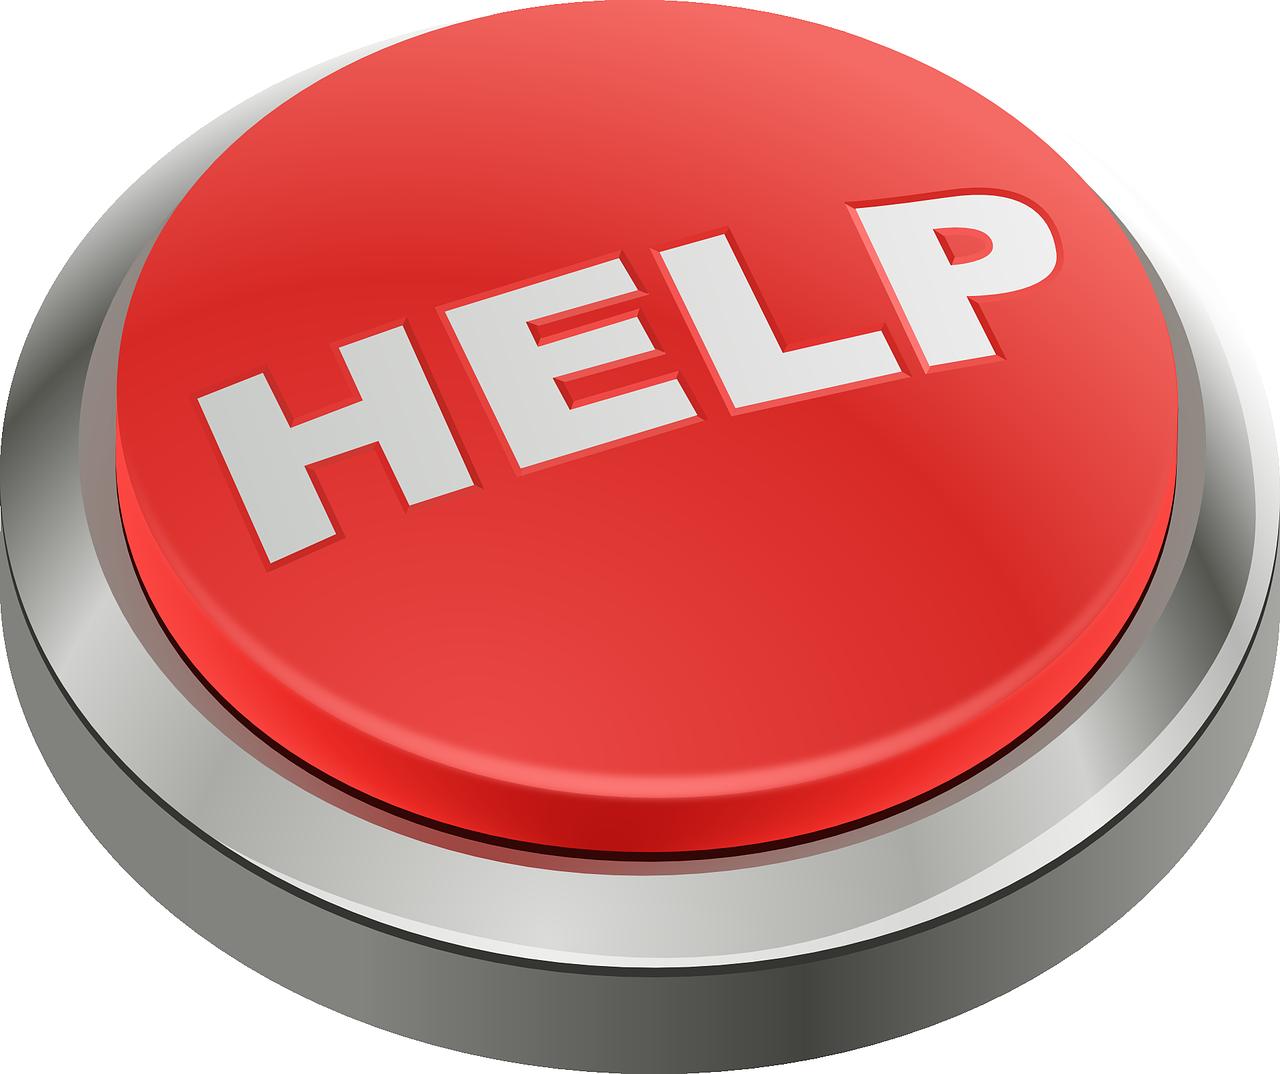 panic help button